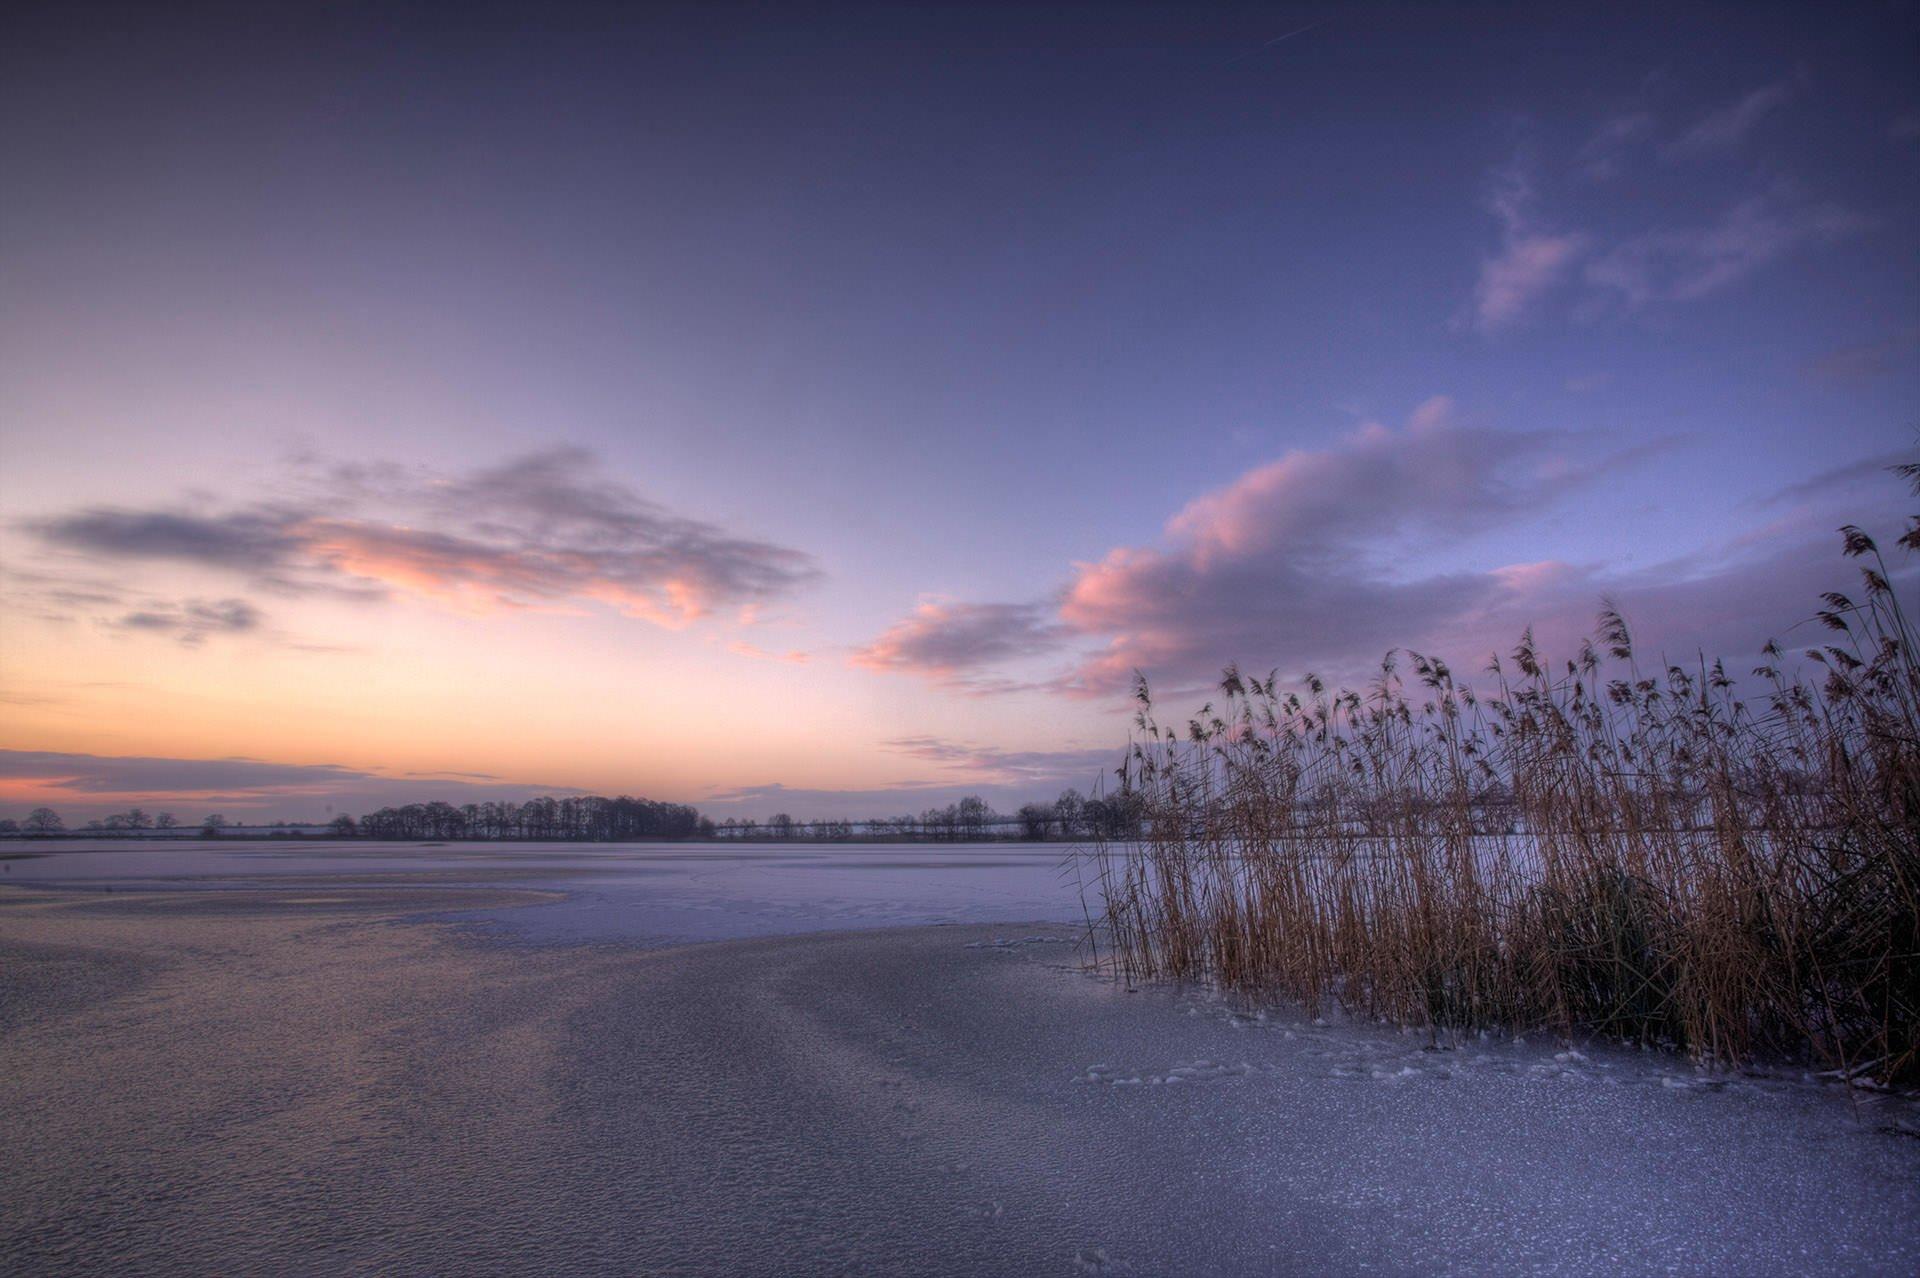 landscape photography 4